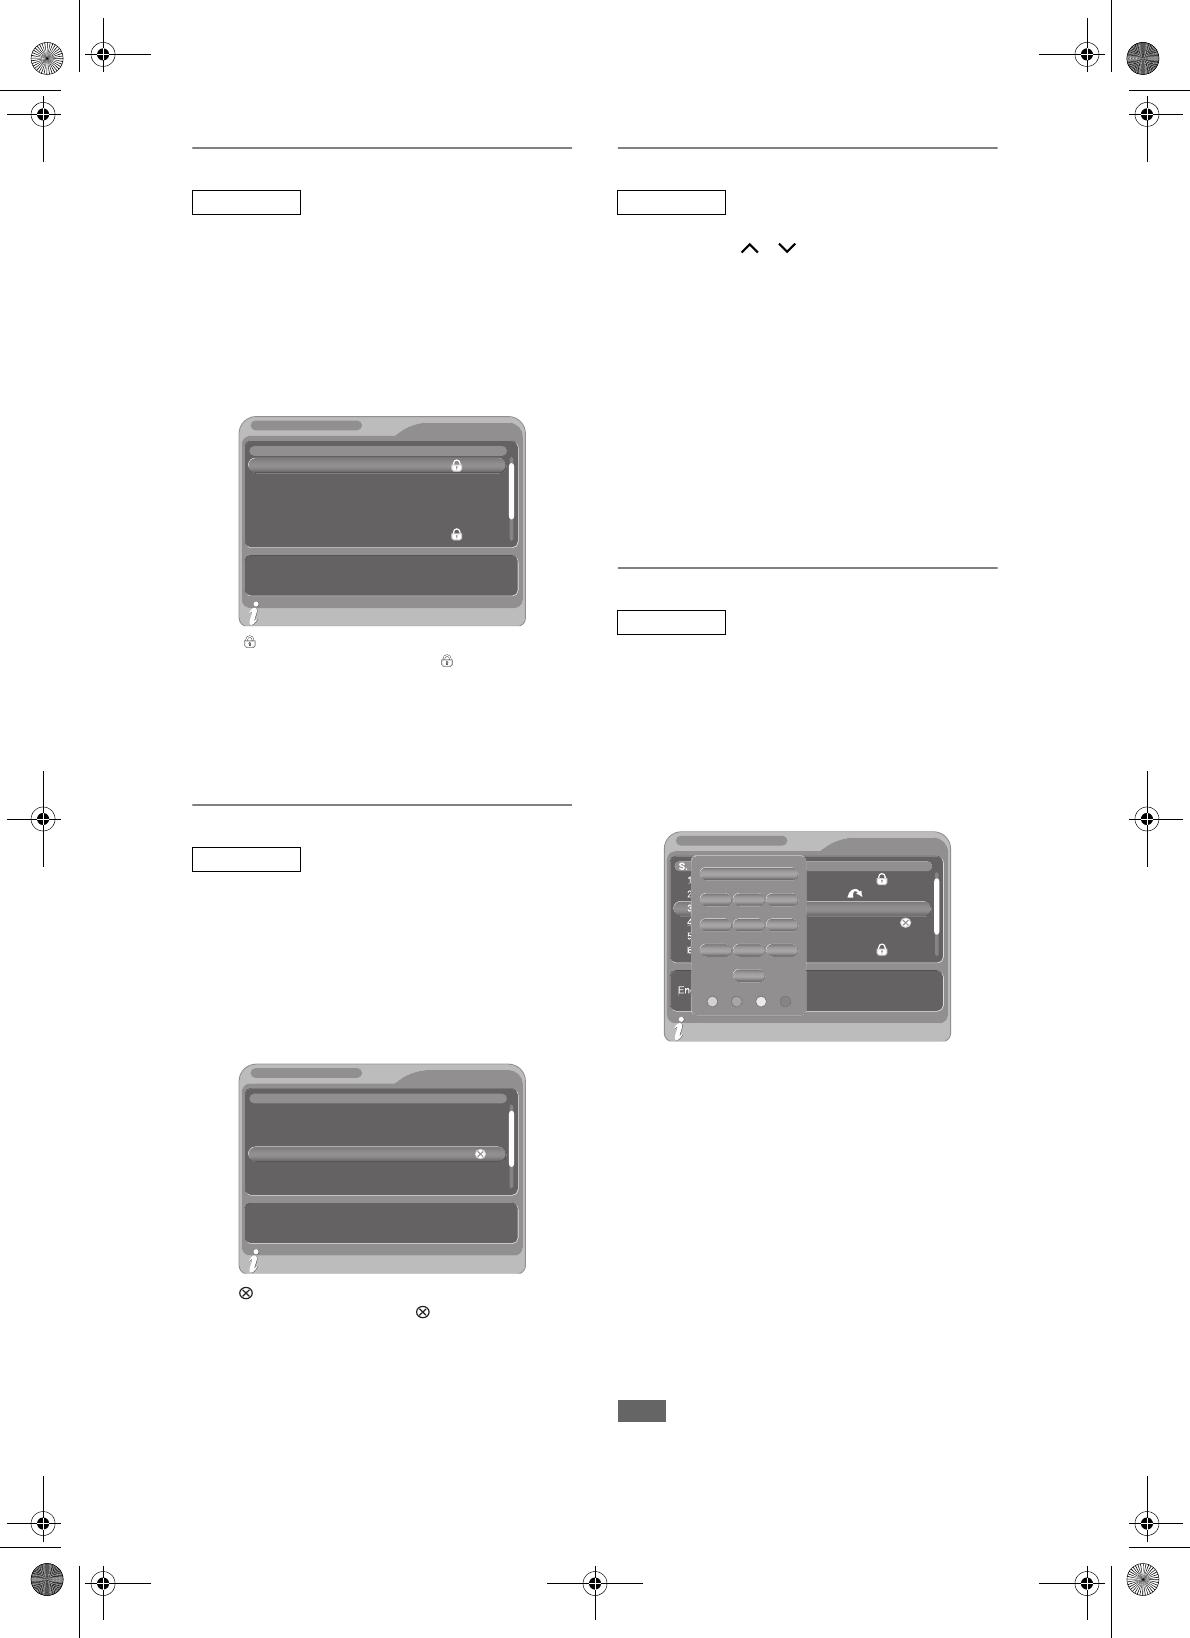 Toshiba Dvr18 Users Manual E9NG1BD_EN